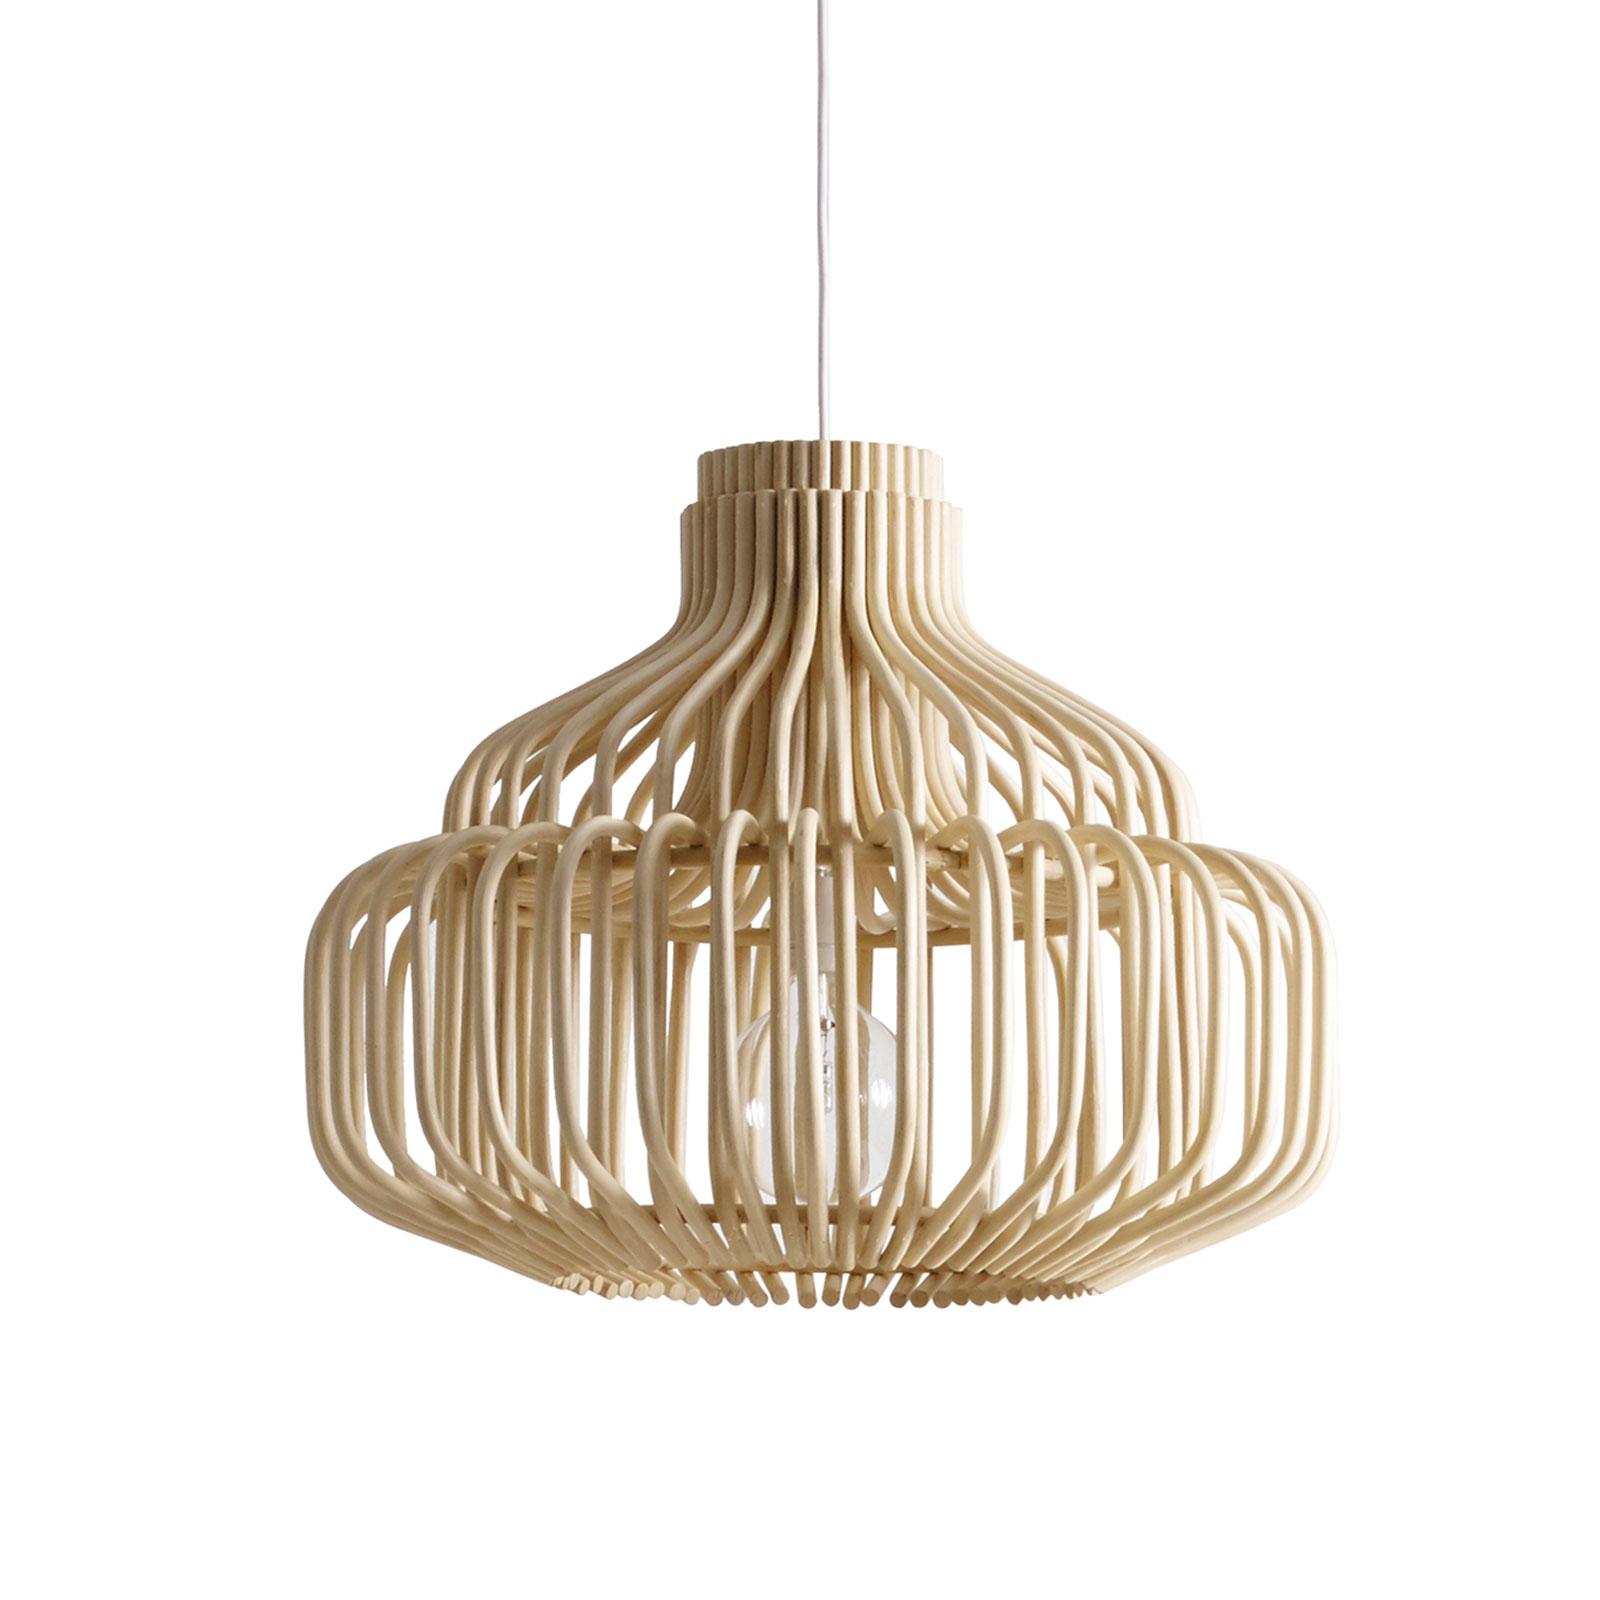 Rattan Lamps By Vincent Sheppard Sohomod Blog